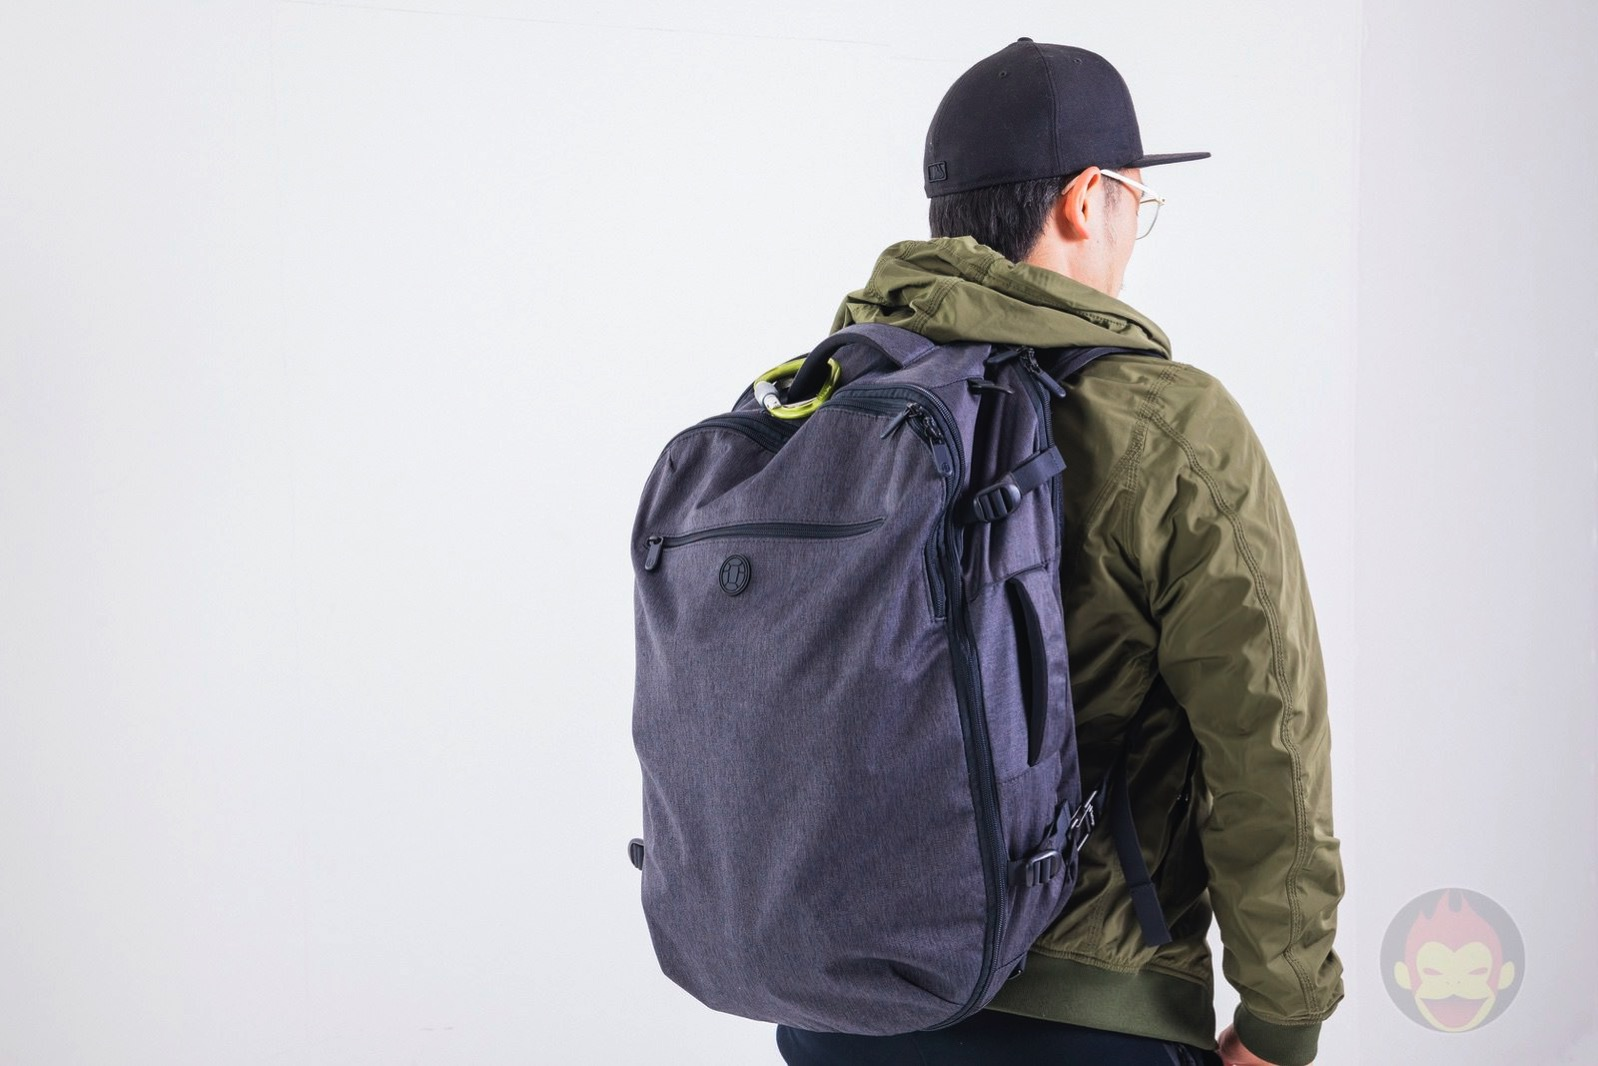 Tortuga-Setout-Backpack-35liter-review-41.jpg